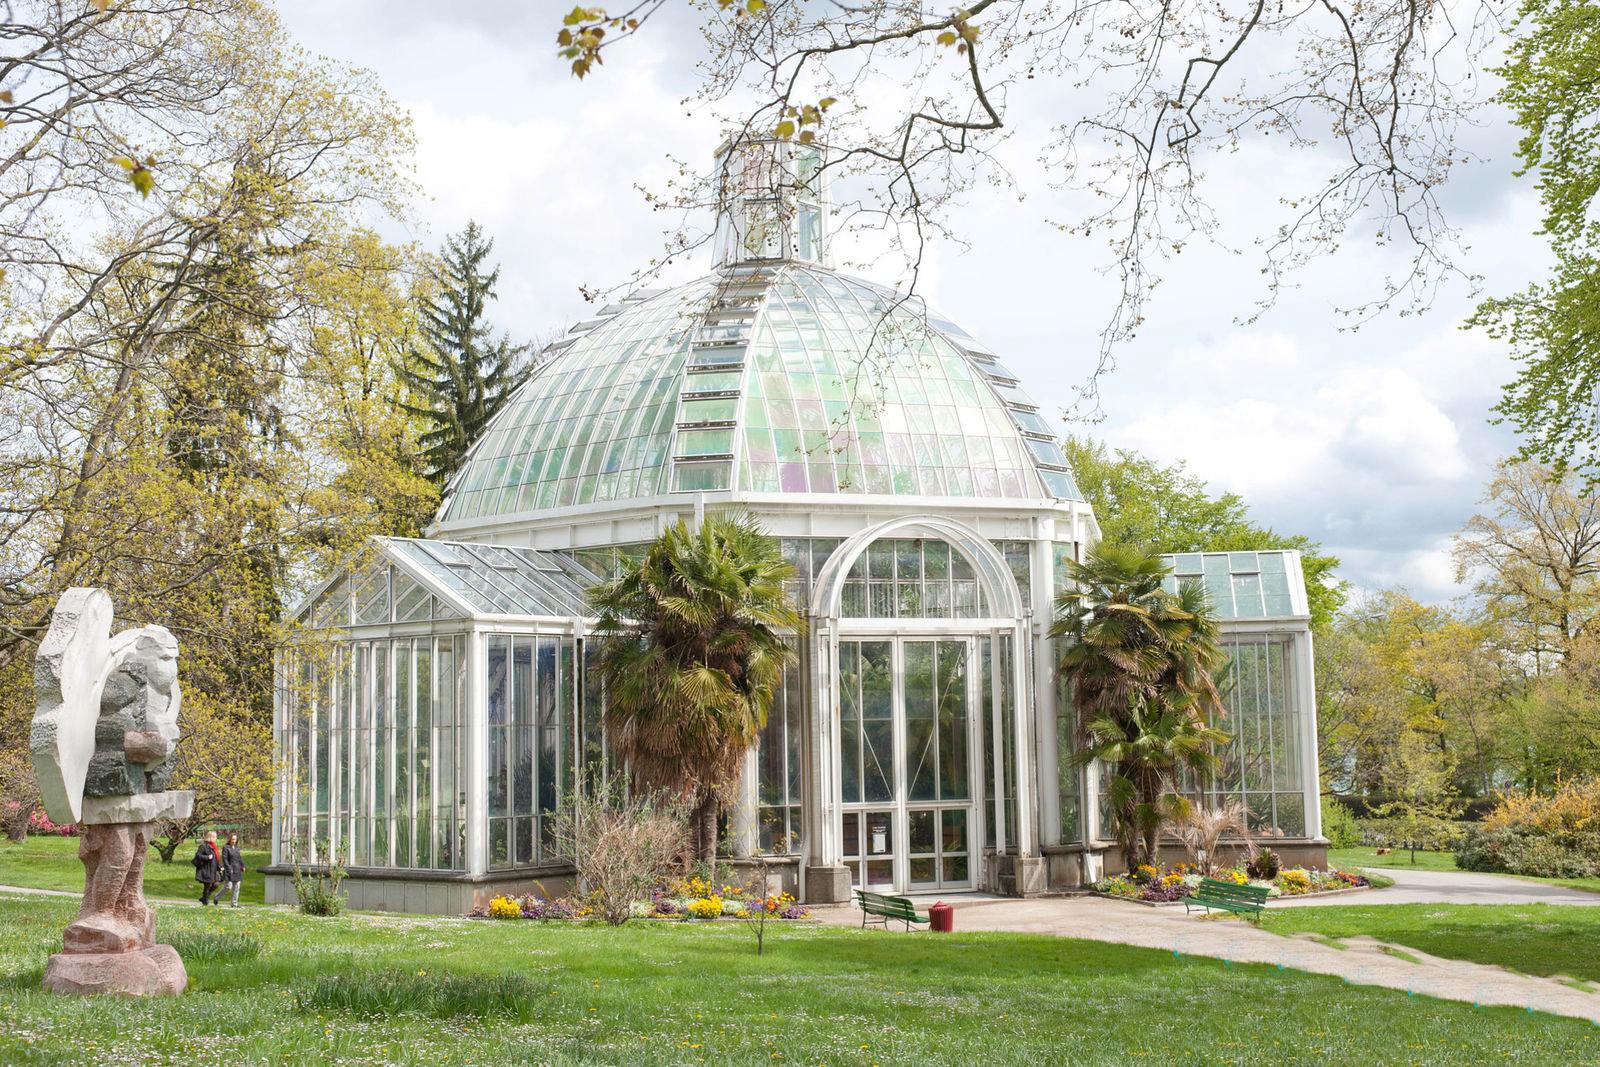 باغ گیاهشناسی ژنو